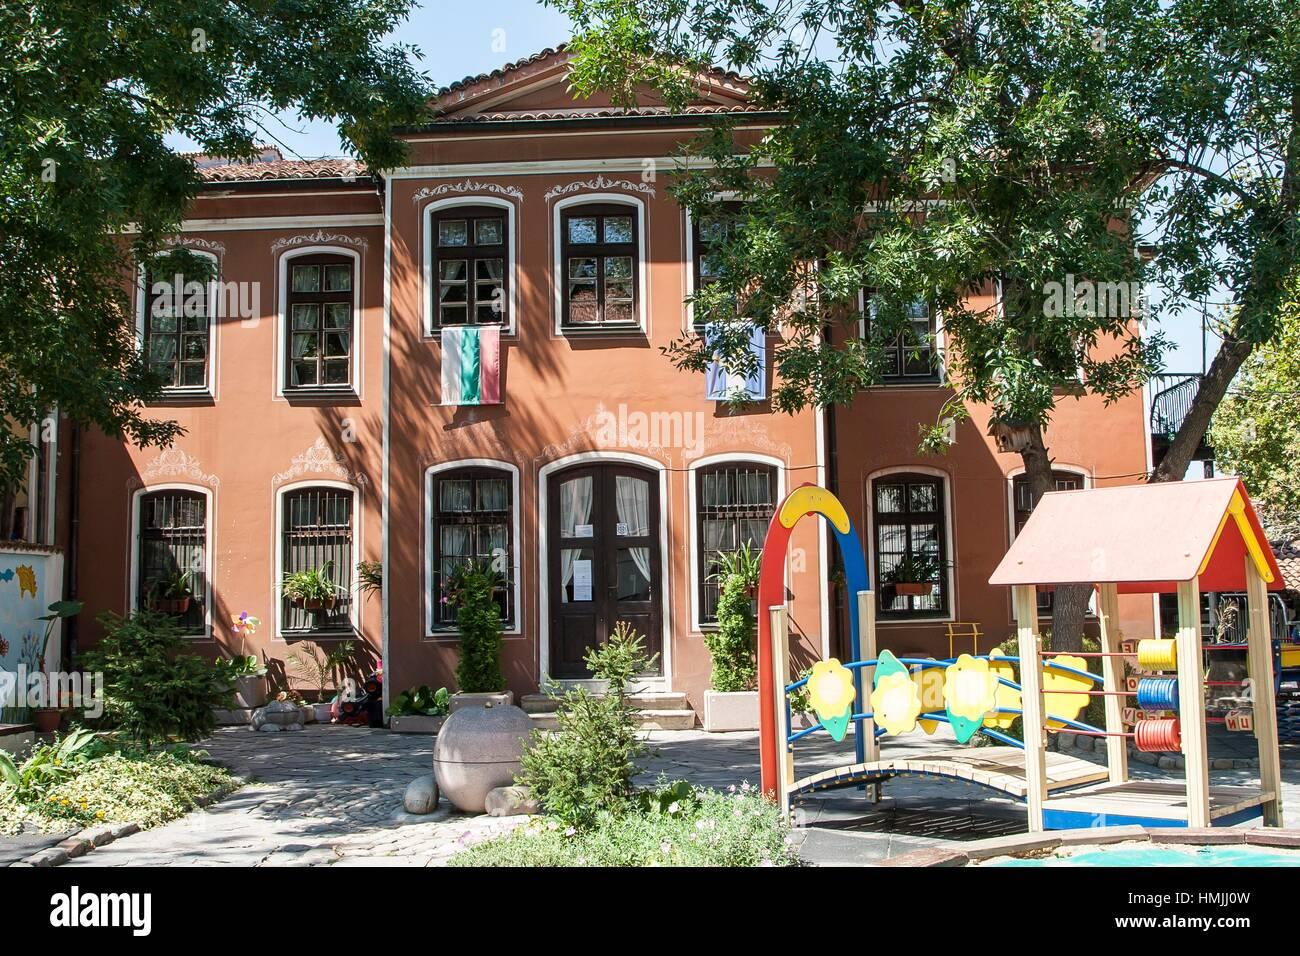 Kindergarten ''Cricket'', Plovdiv, Bulgaria. - Stock Image